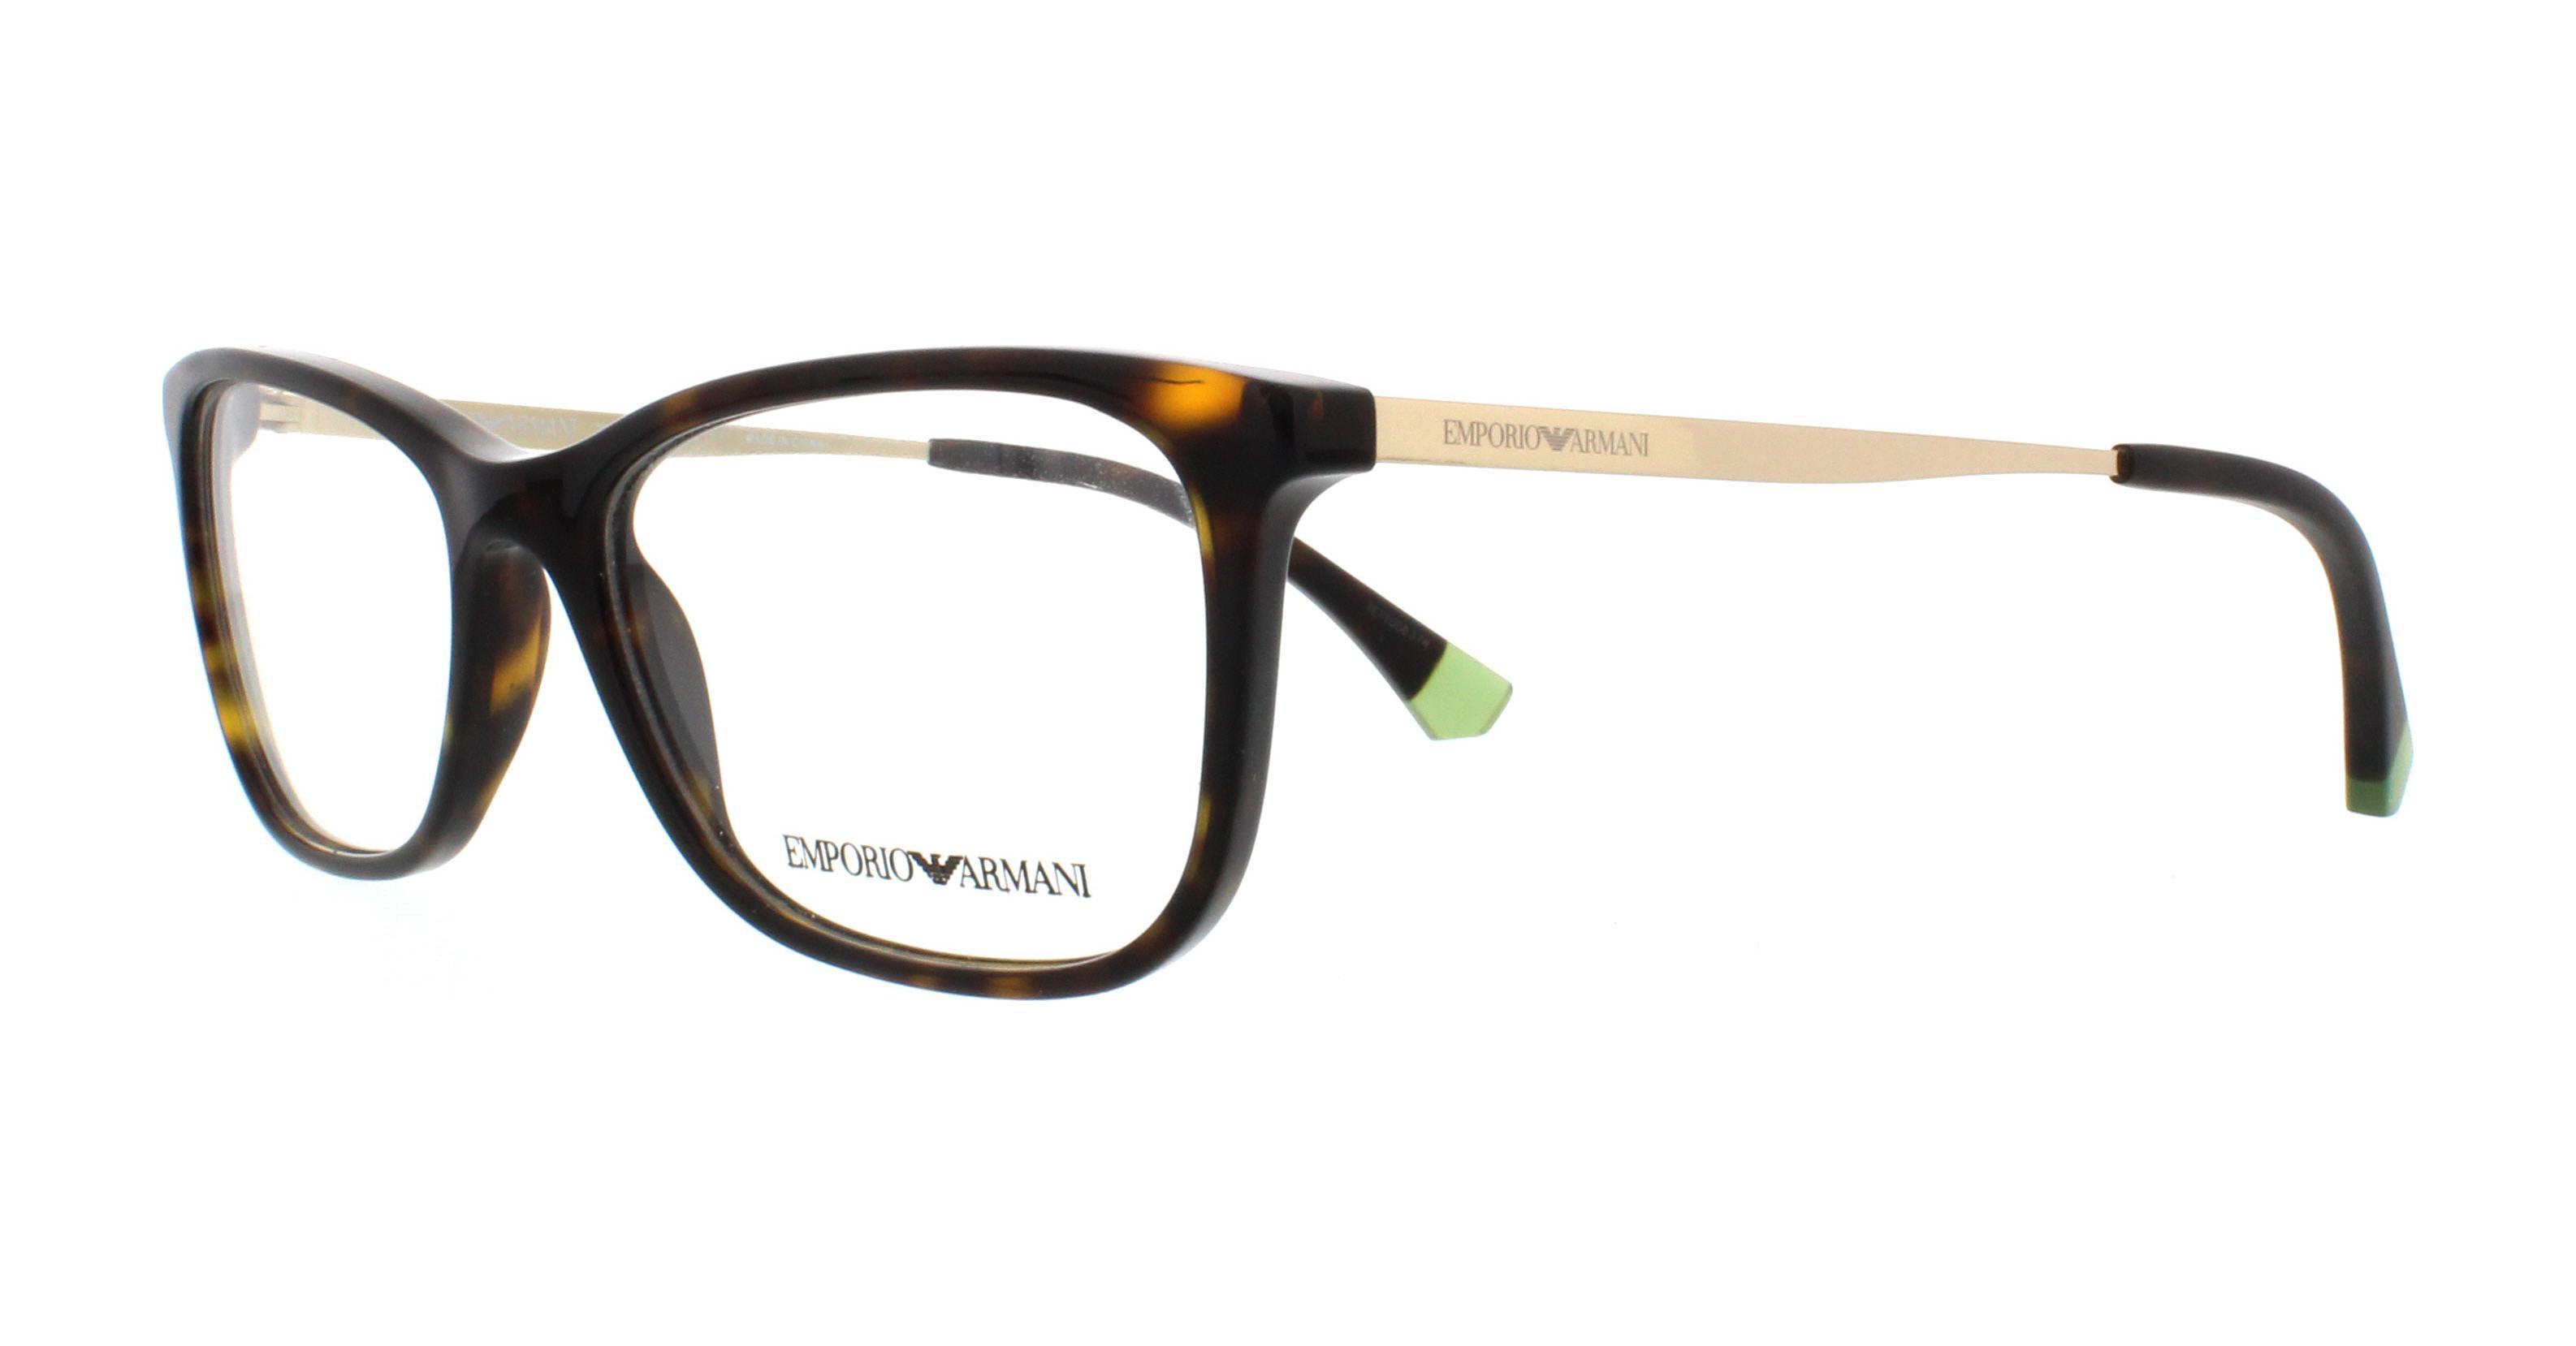 51ef6b9cc73 EMPORIO ARMANI Eyeglasses EA3119 5089 Dark Havana 52MM 8053672746938 ...